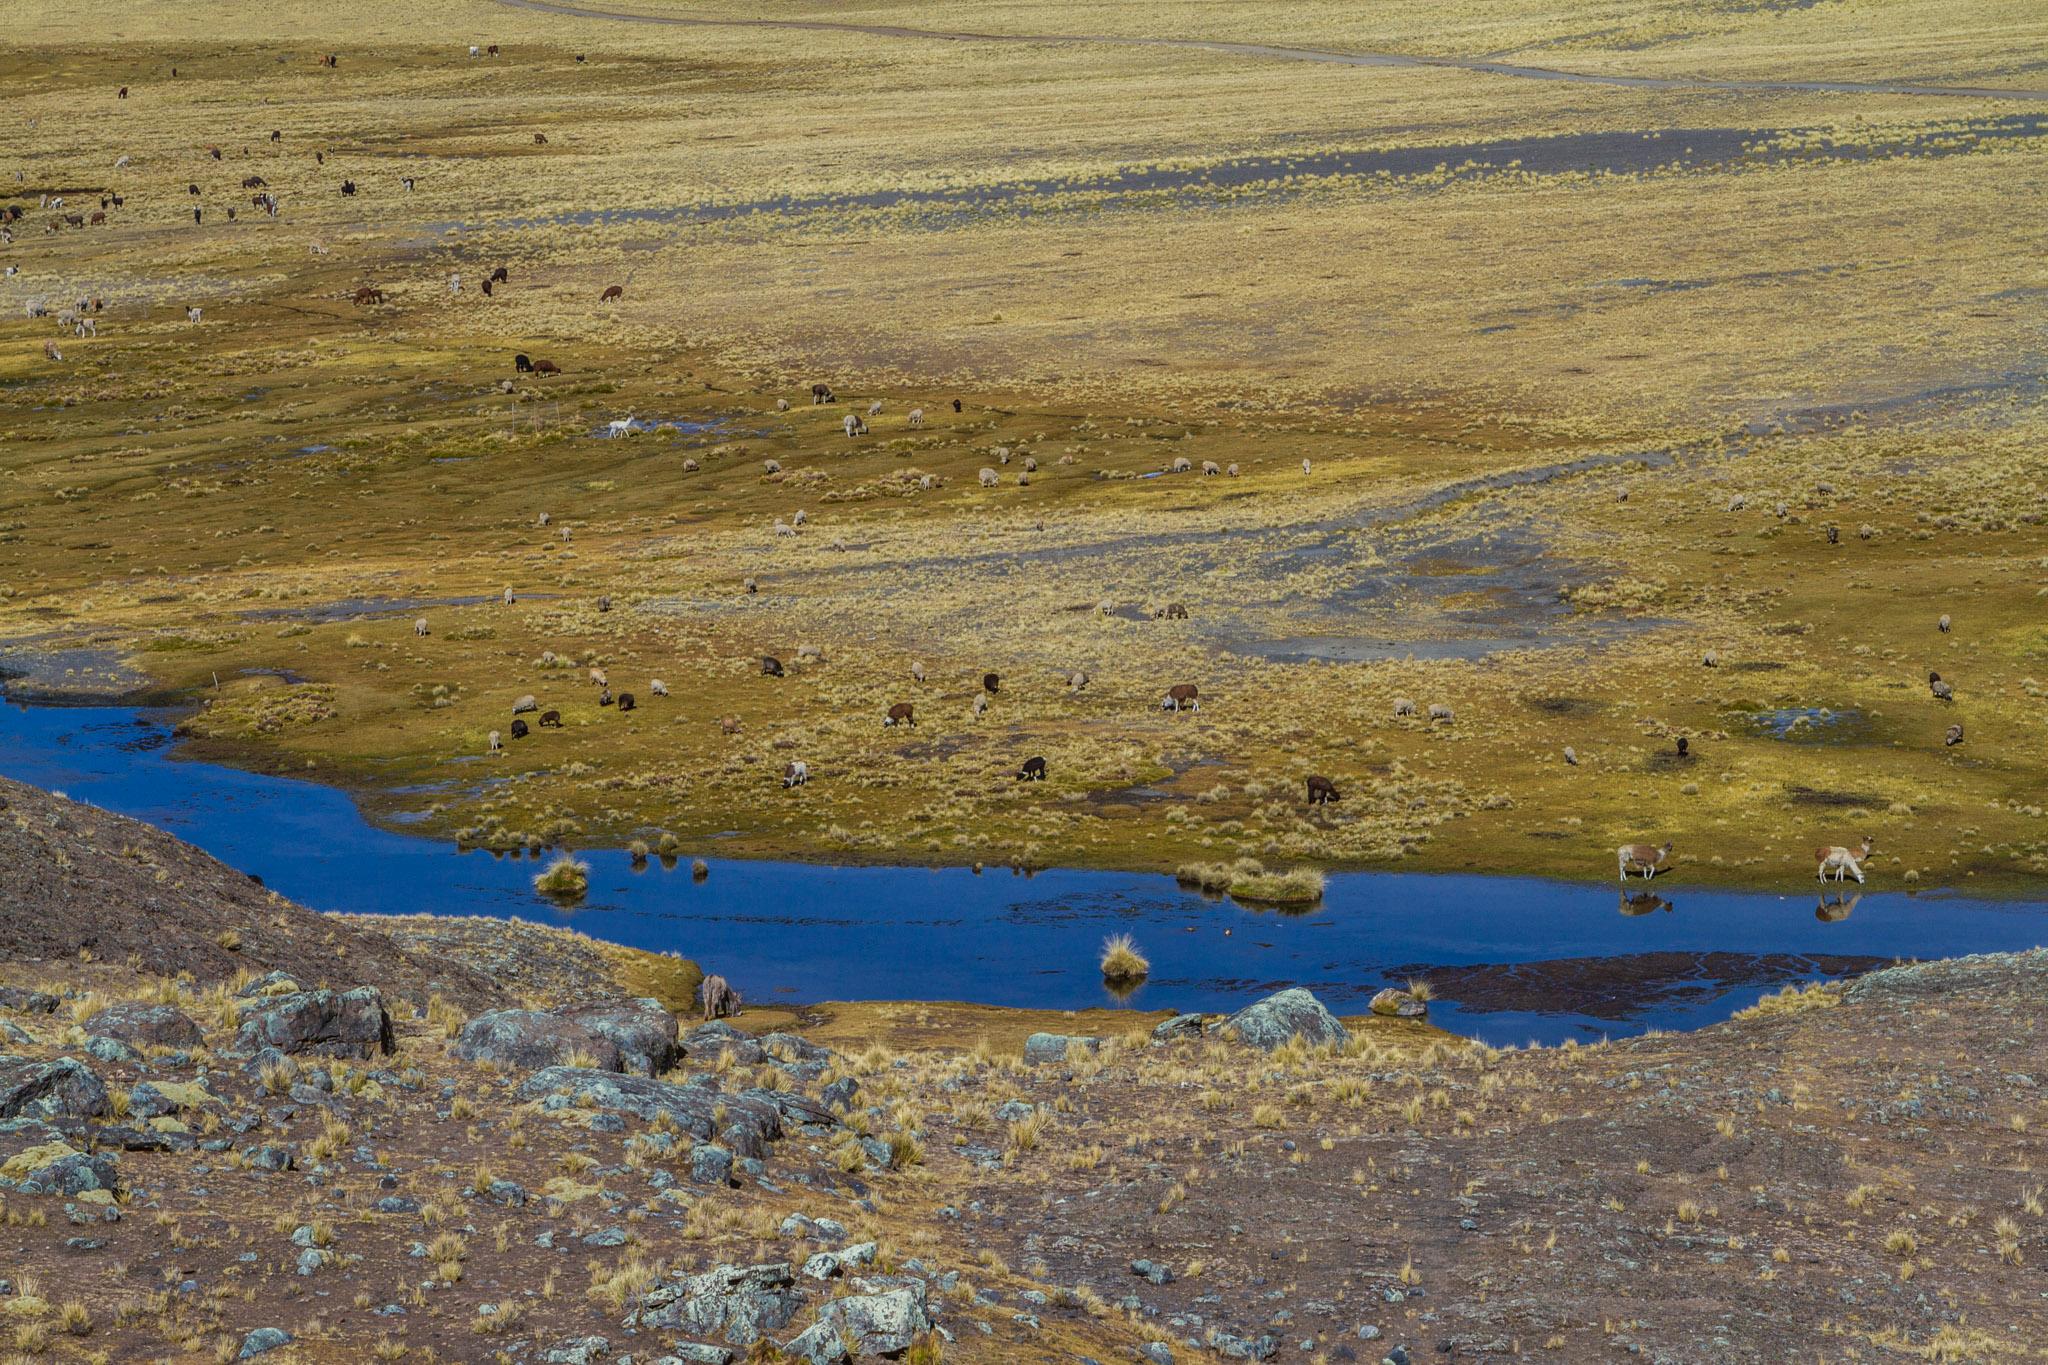 Ali-Barqawi-Studios-Explore-Series-Travel-Adventure-Documentary-C4CGAZA-Bolivia-Mount-Tarija-2015-246.jpg